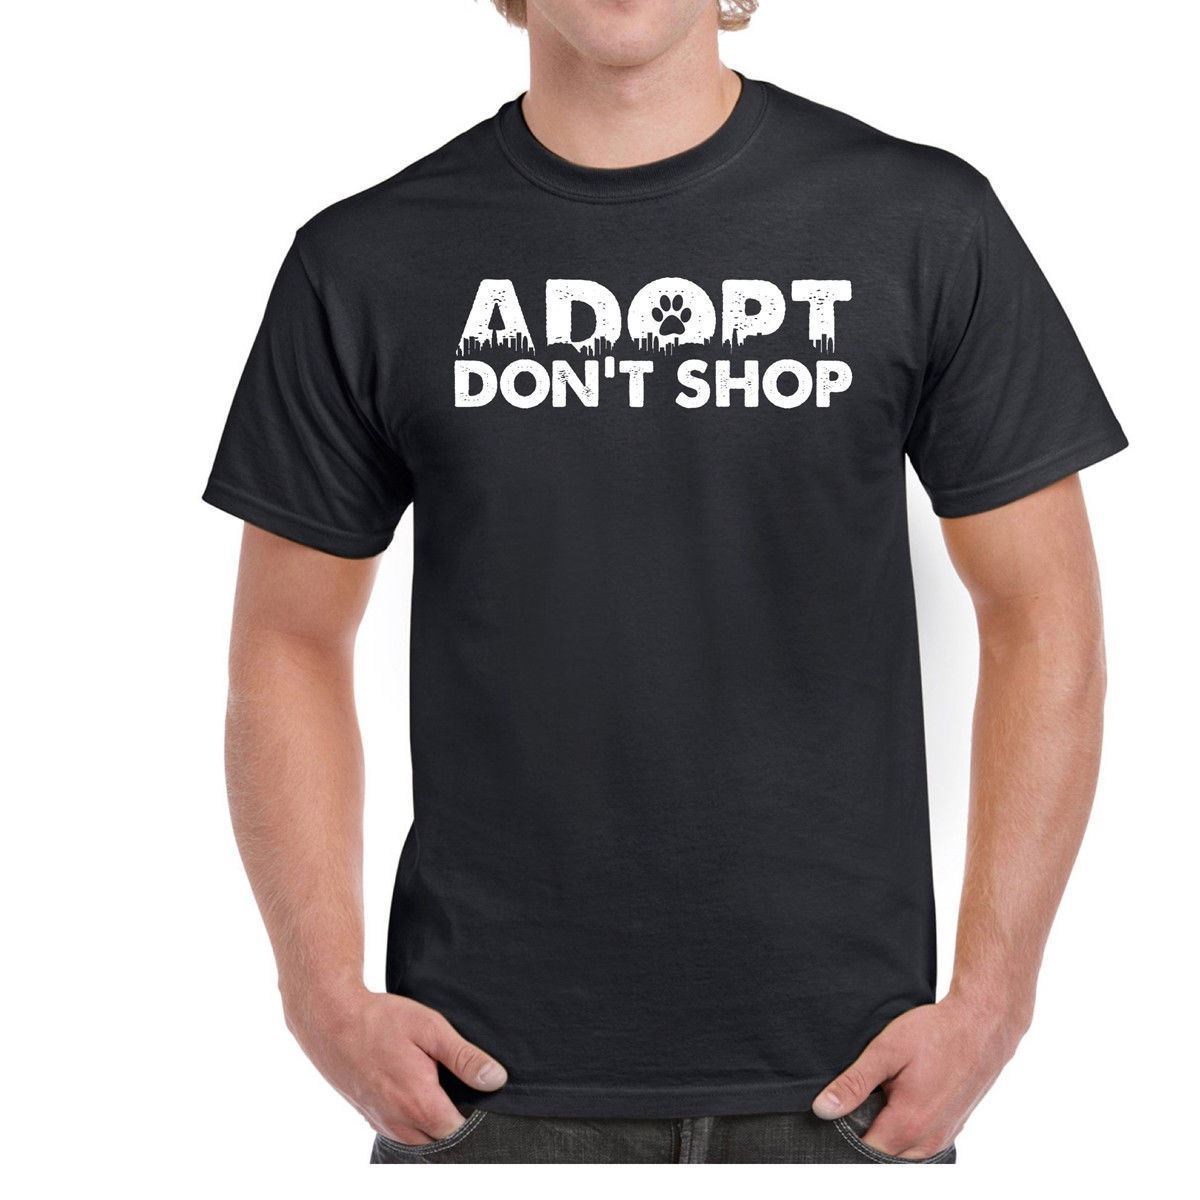 Adopt Dont Shop Mens Tee Shirt 100% Cotton T-shirt Print Tee Men Short Sleeve Clothing T Shirt Short Sleeves 100% Cotton